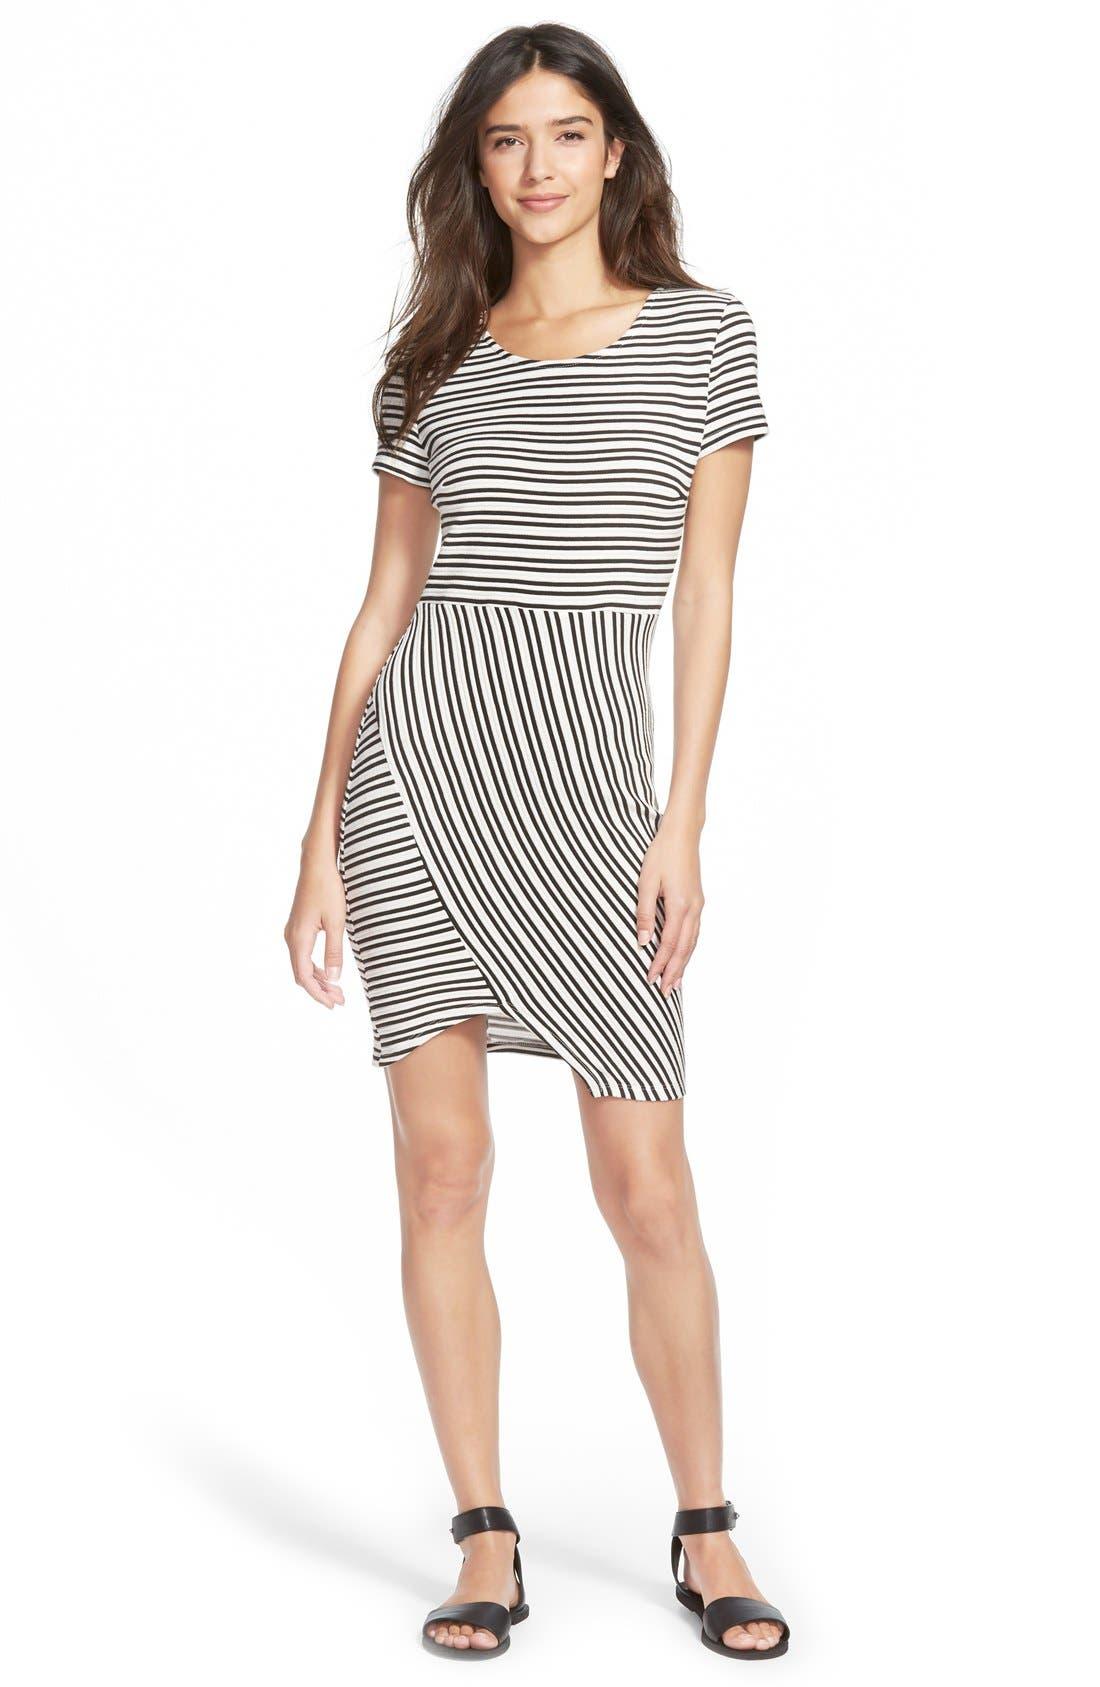 Alternate Image 1 Selected - Lush Stripe Knit Body-Con Dress